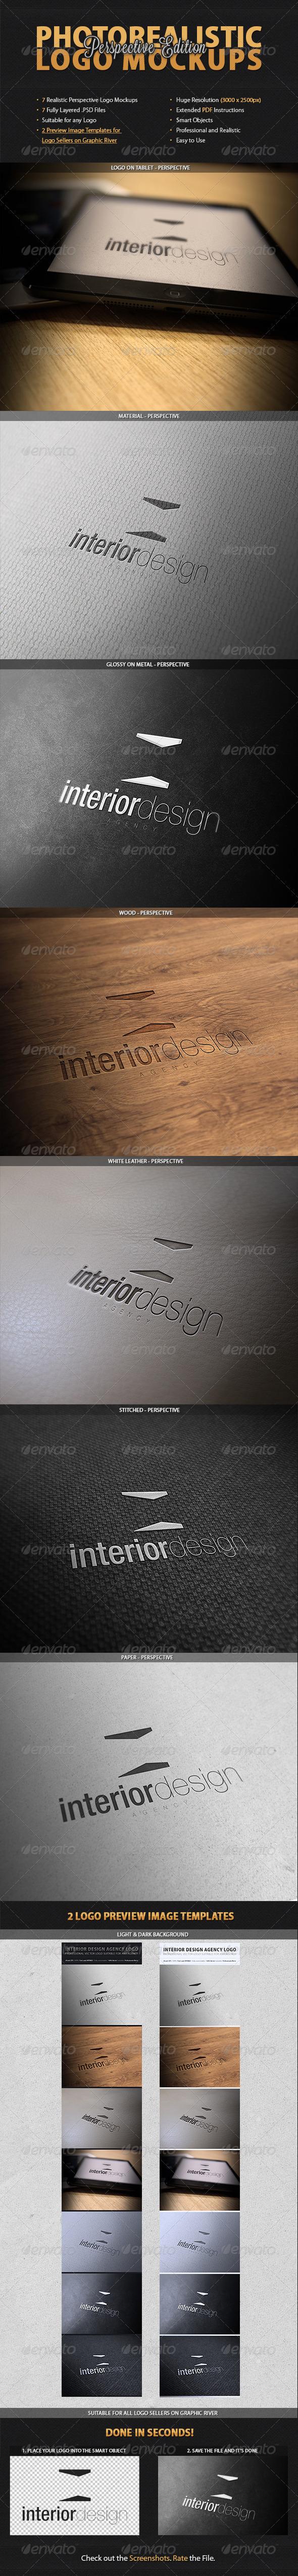 7 Photorealistic Logo Mockups - Perspective - Logo Product Mock-Ups